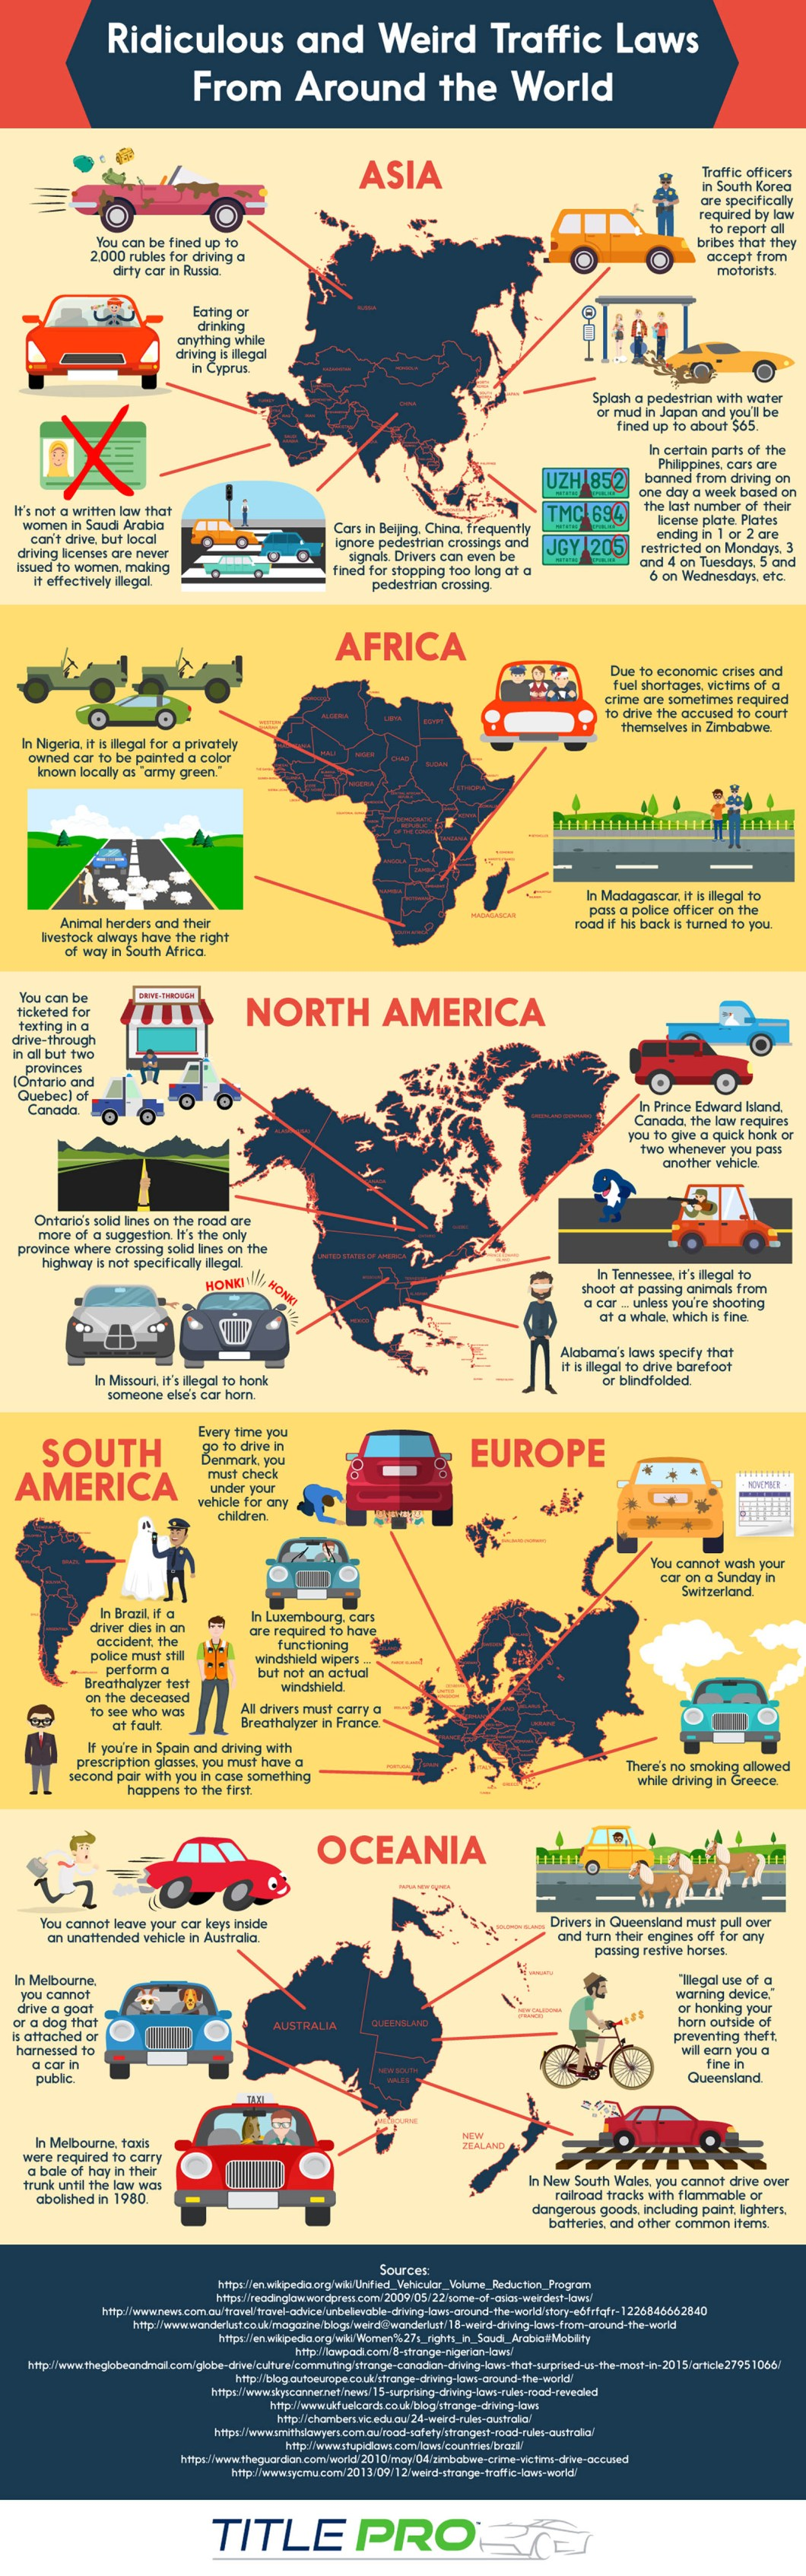 Strangely Shocking Traffic Laws Around The World - Infographic